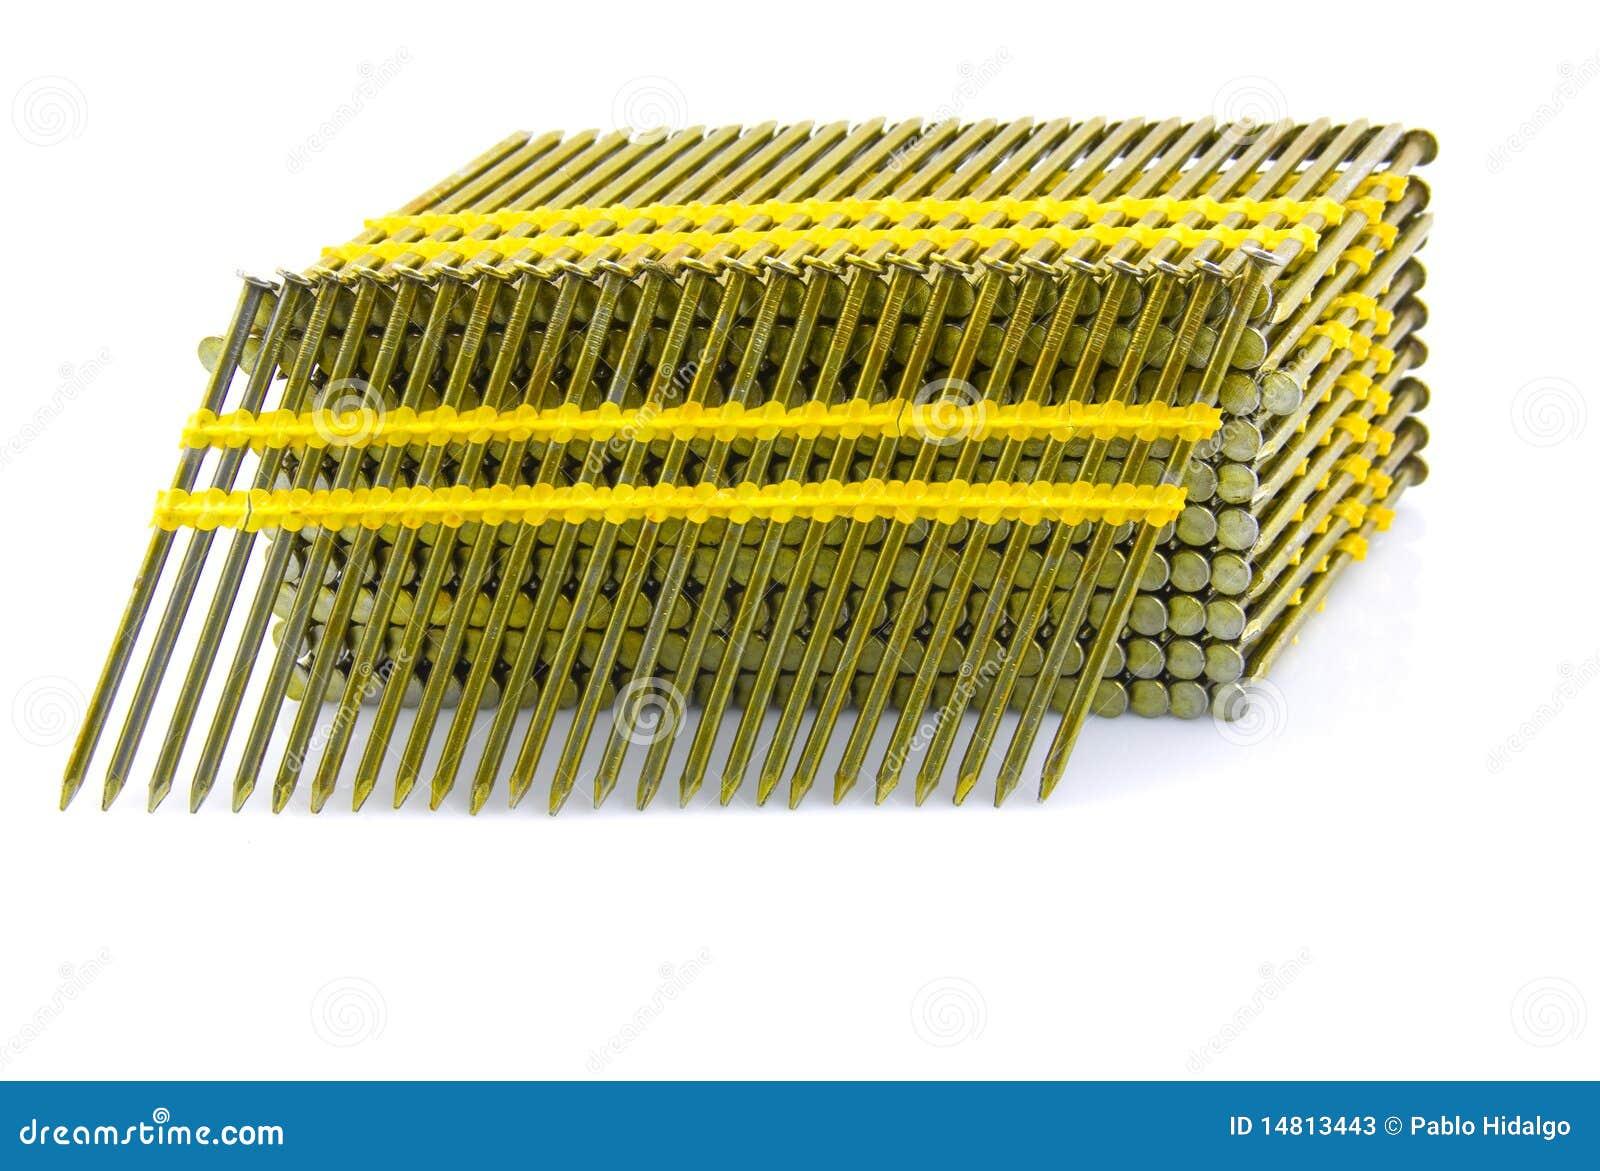 Plástico principal redondo pregos de quadro ordenados